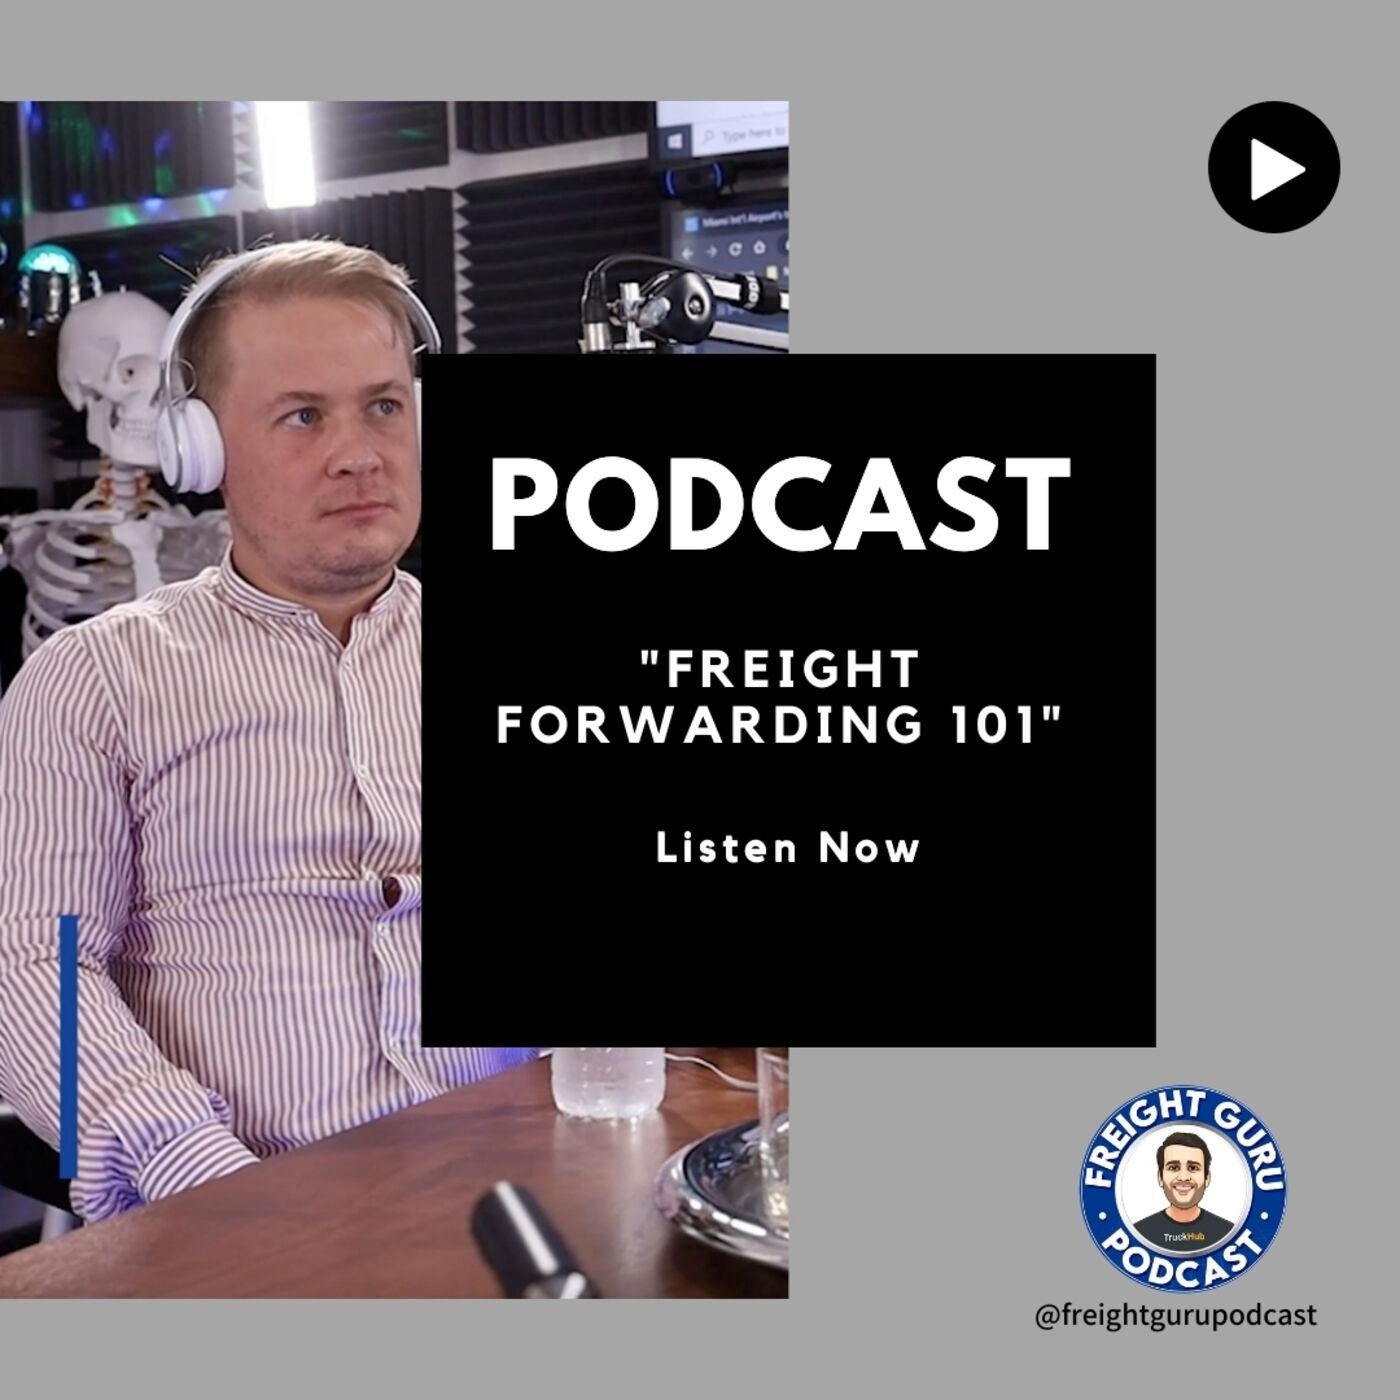 Freight Forwarding 101 - Freight Guru Podcast Ep. 14 PART 2